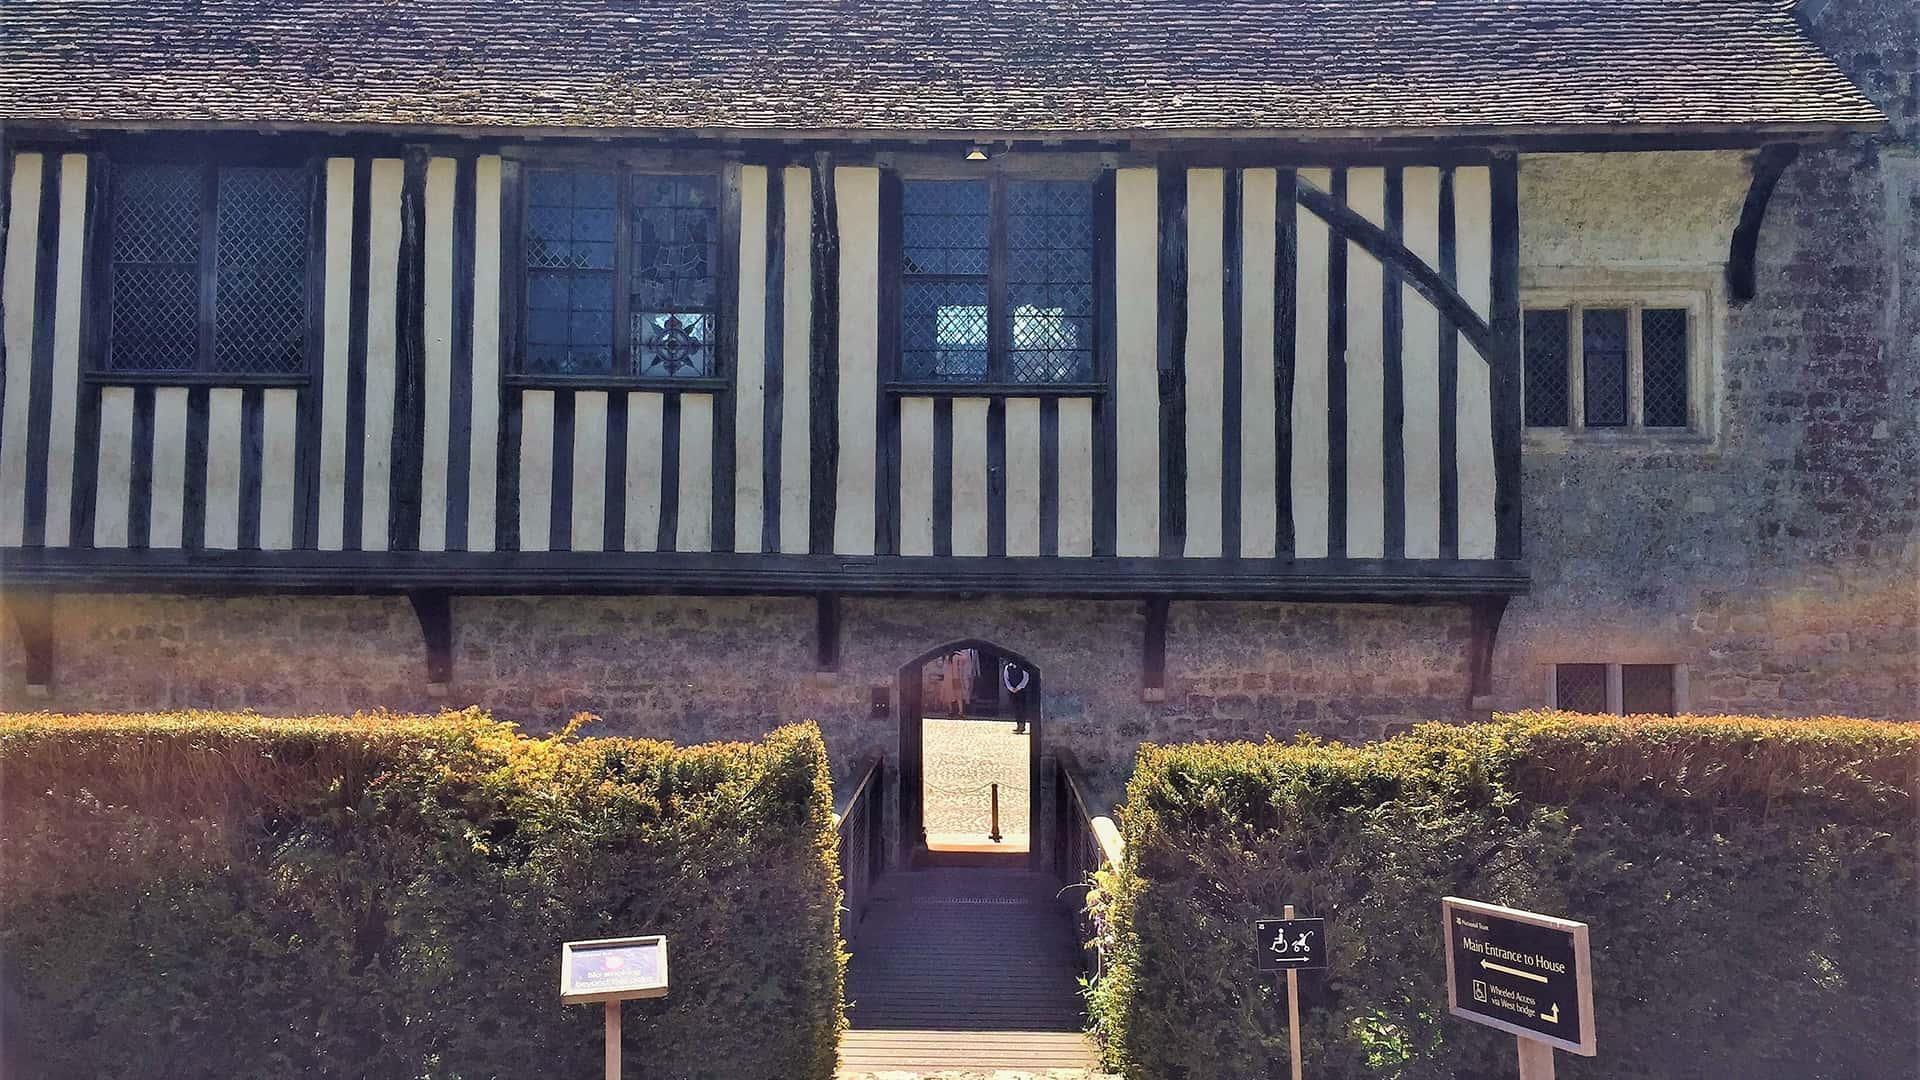 Medieval England – Ightham Mote